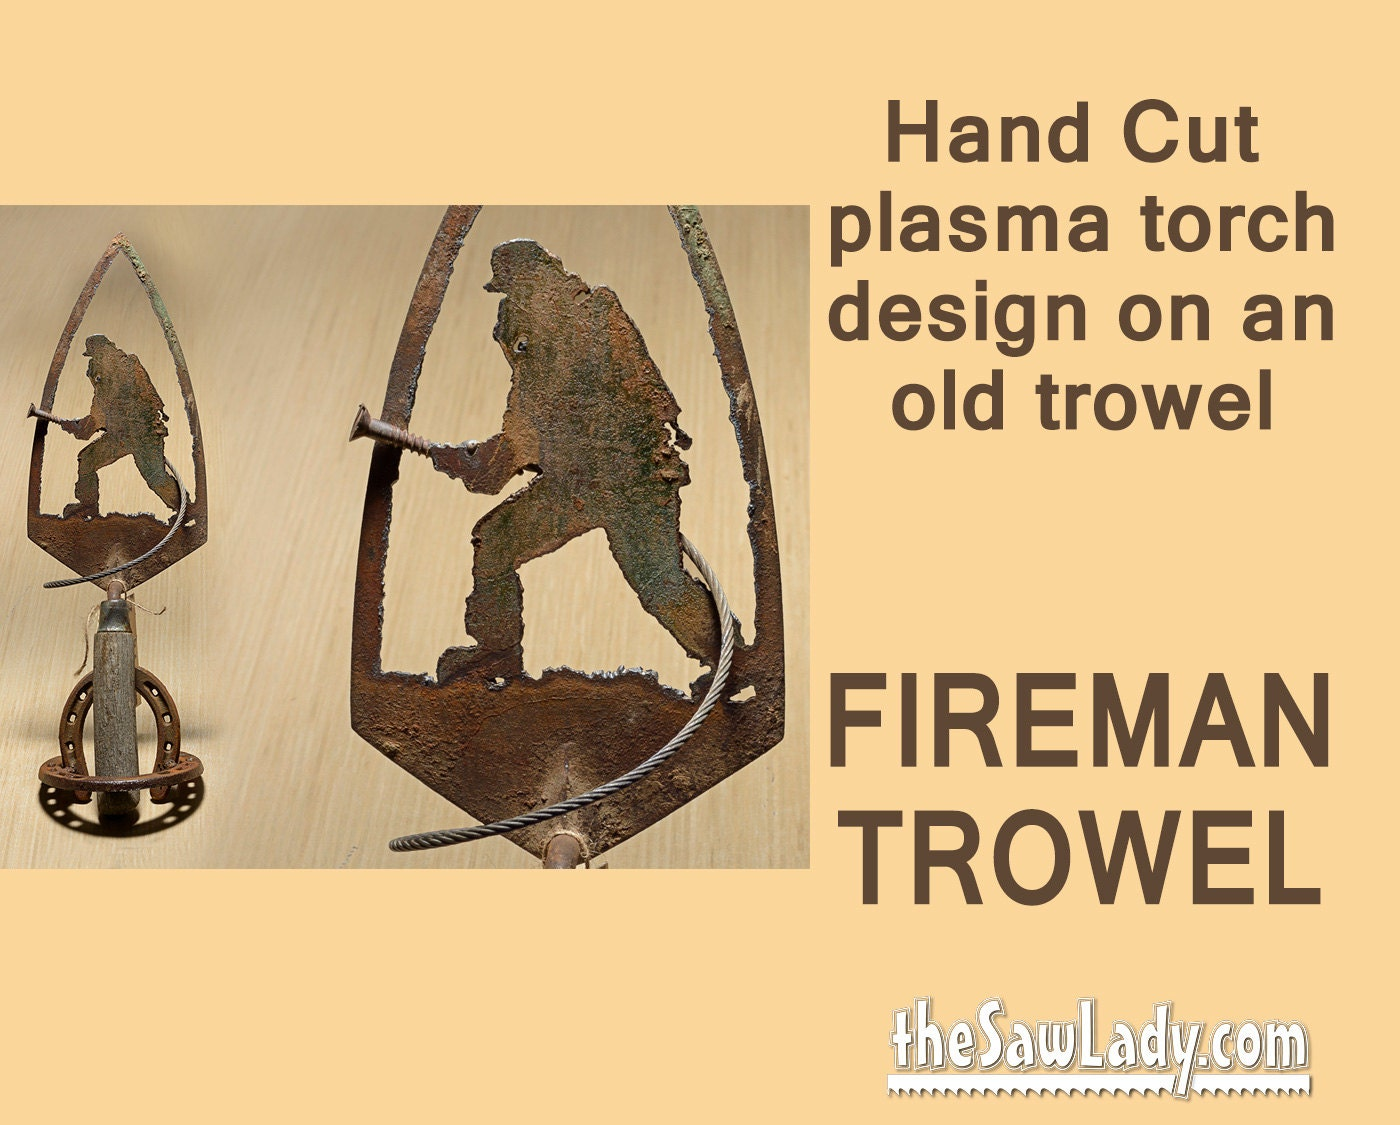 Metal Art Trowel with Firefighter Design Hand plasma Cut